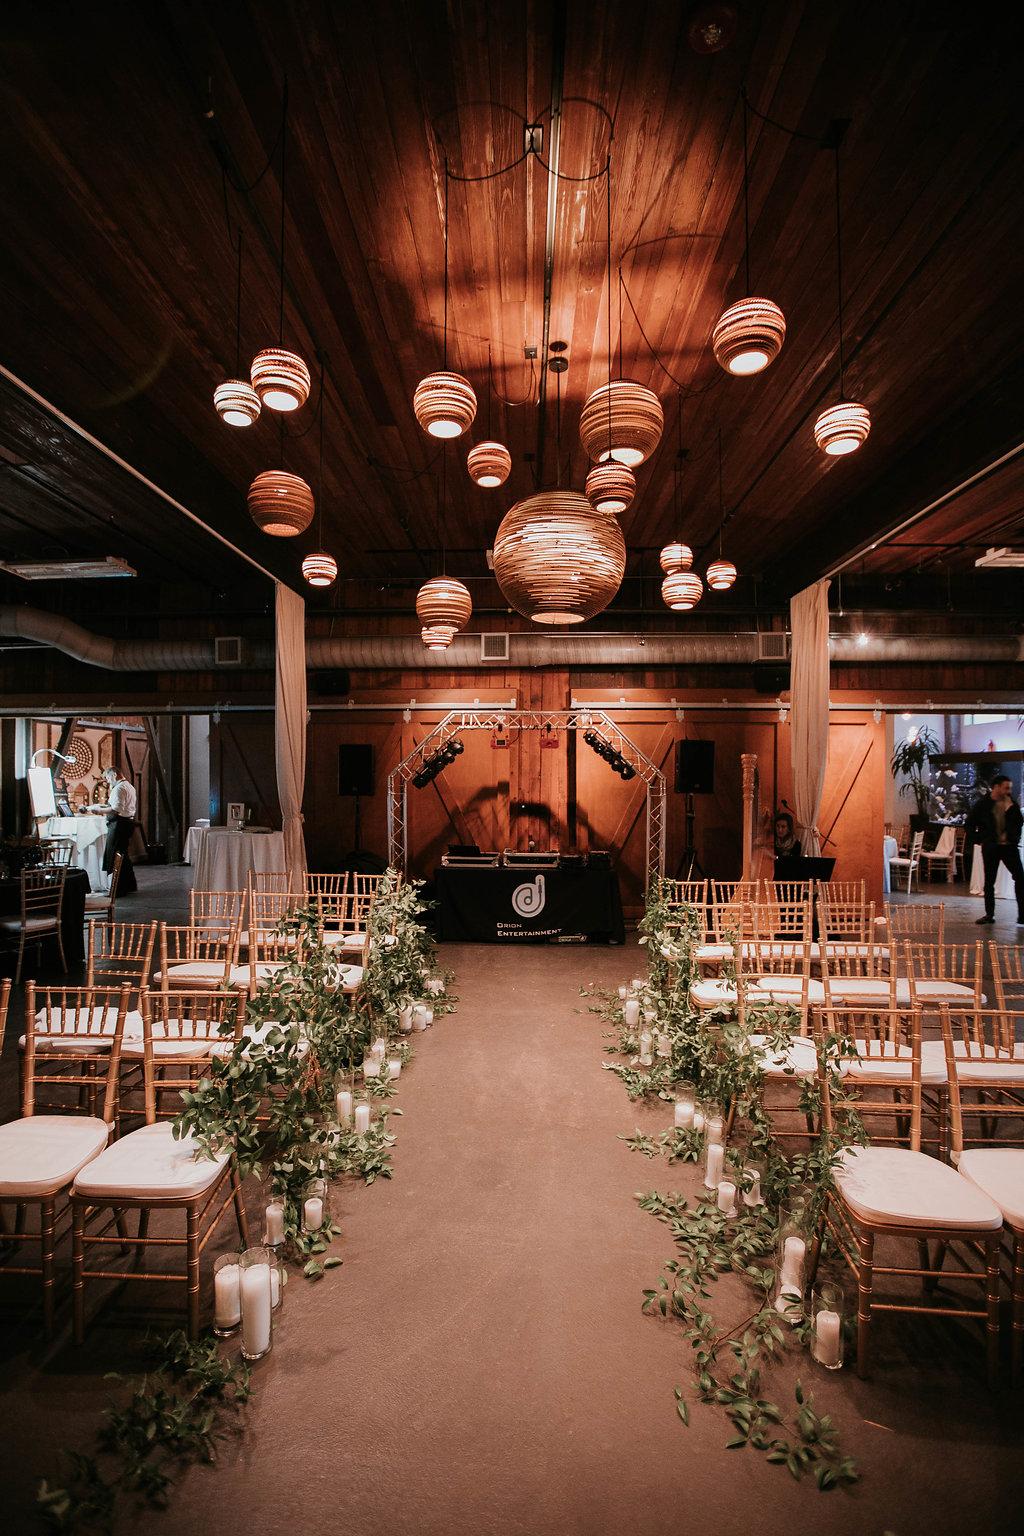 The_Big_Fake_wedding_Seattle_Within_sodo_wedding_by_Adina_Preston_Weddings_301.JPG